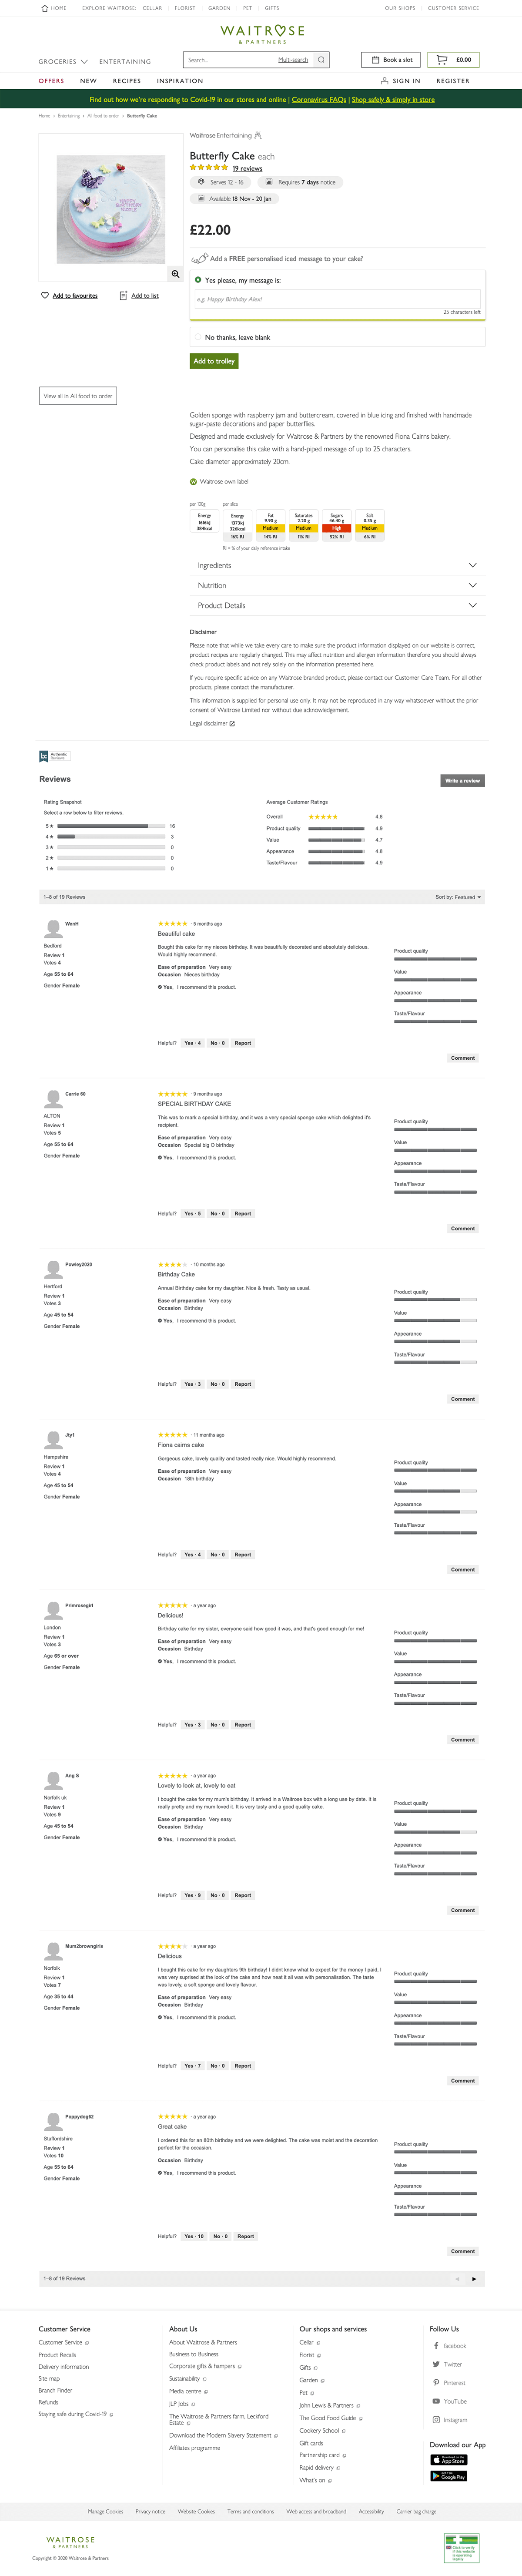 Waitrose Online Cake Order Page